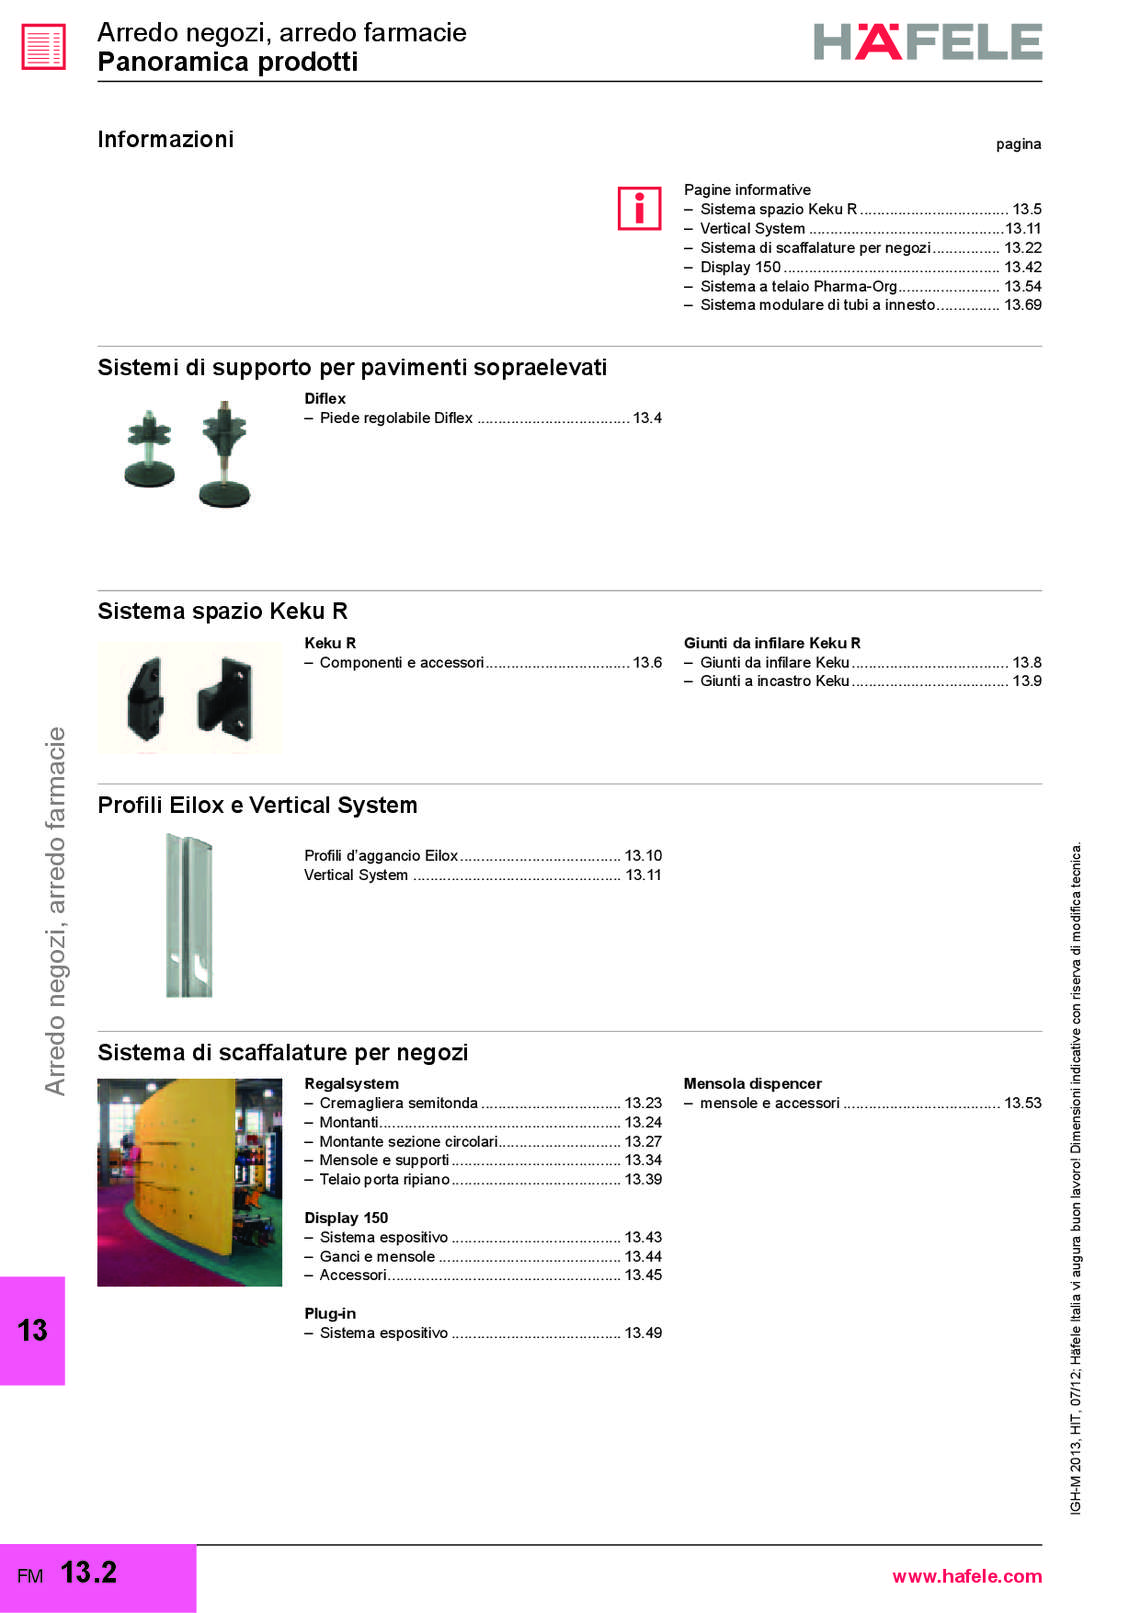 hafele-arredo-negozi-e-farmacie_32_011.jpg